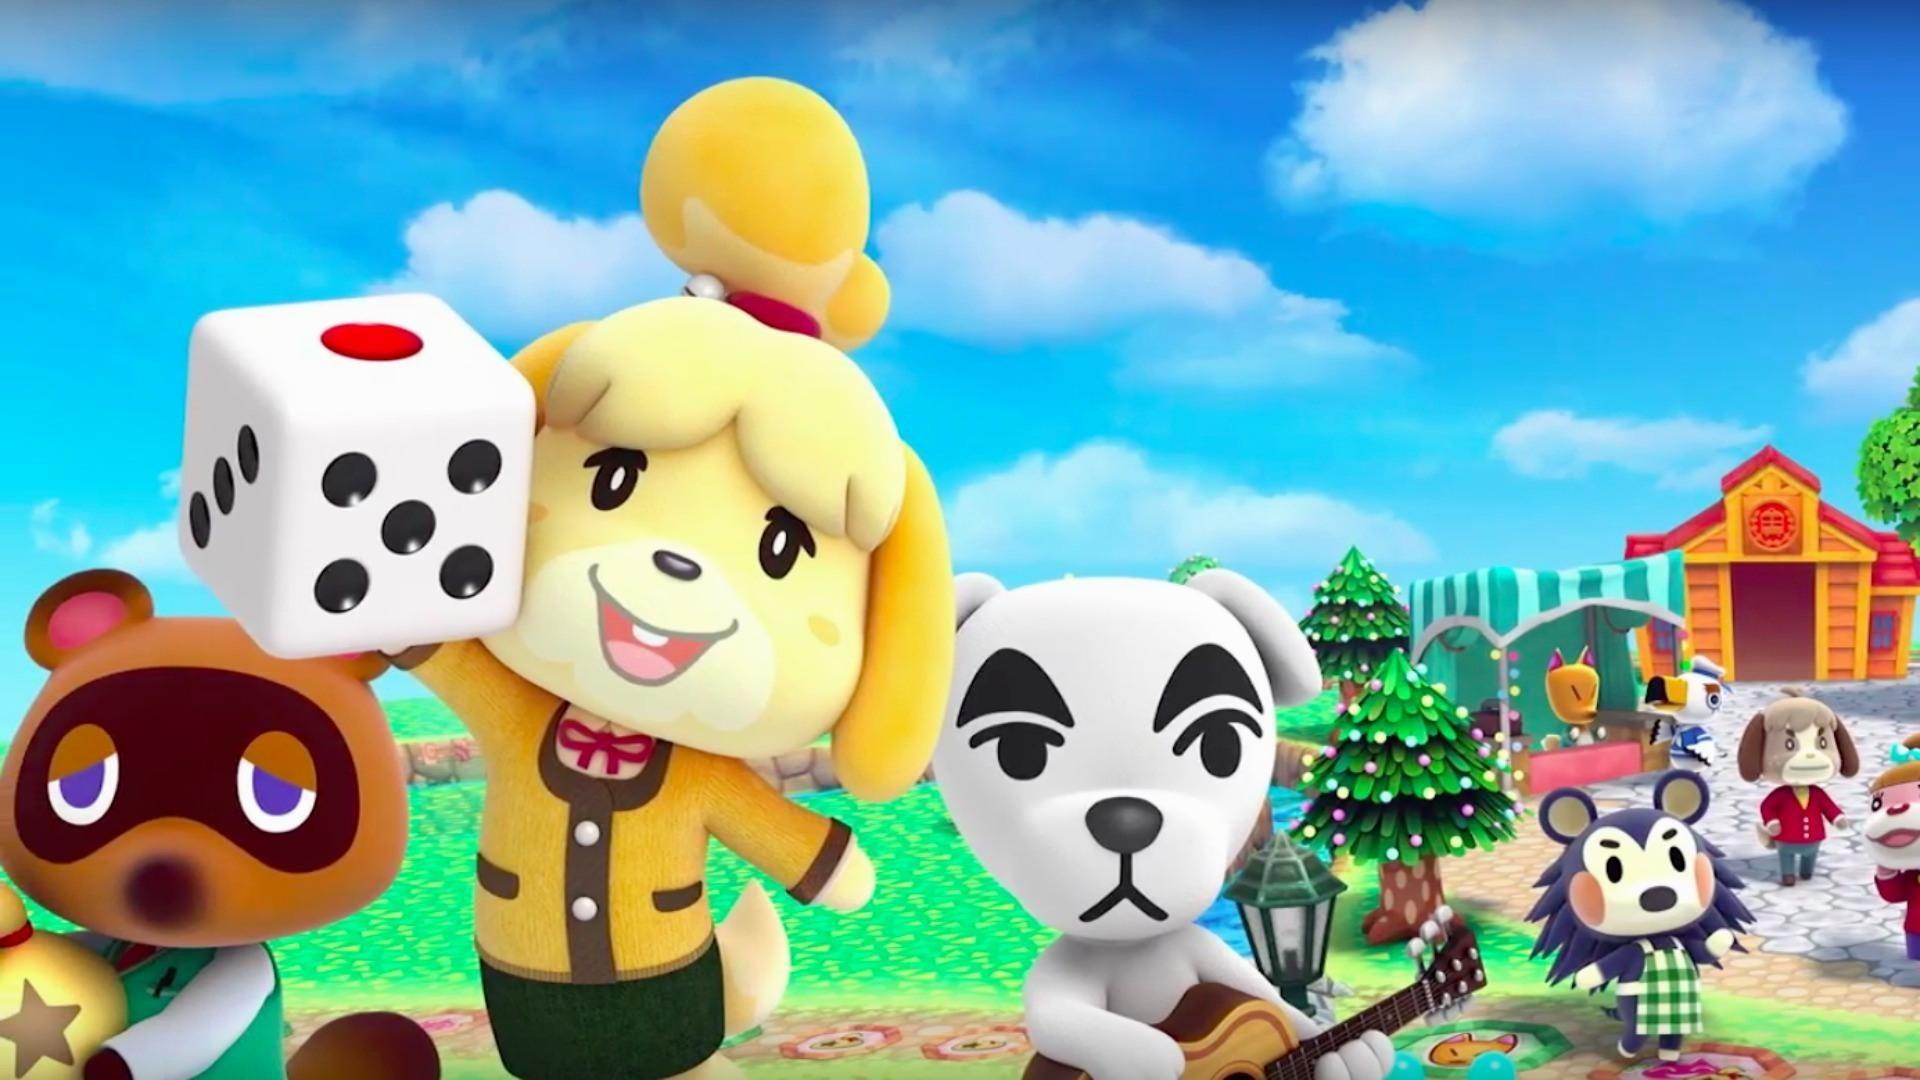 Animal Crossing HD Wallpaper (82+ images)